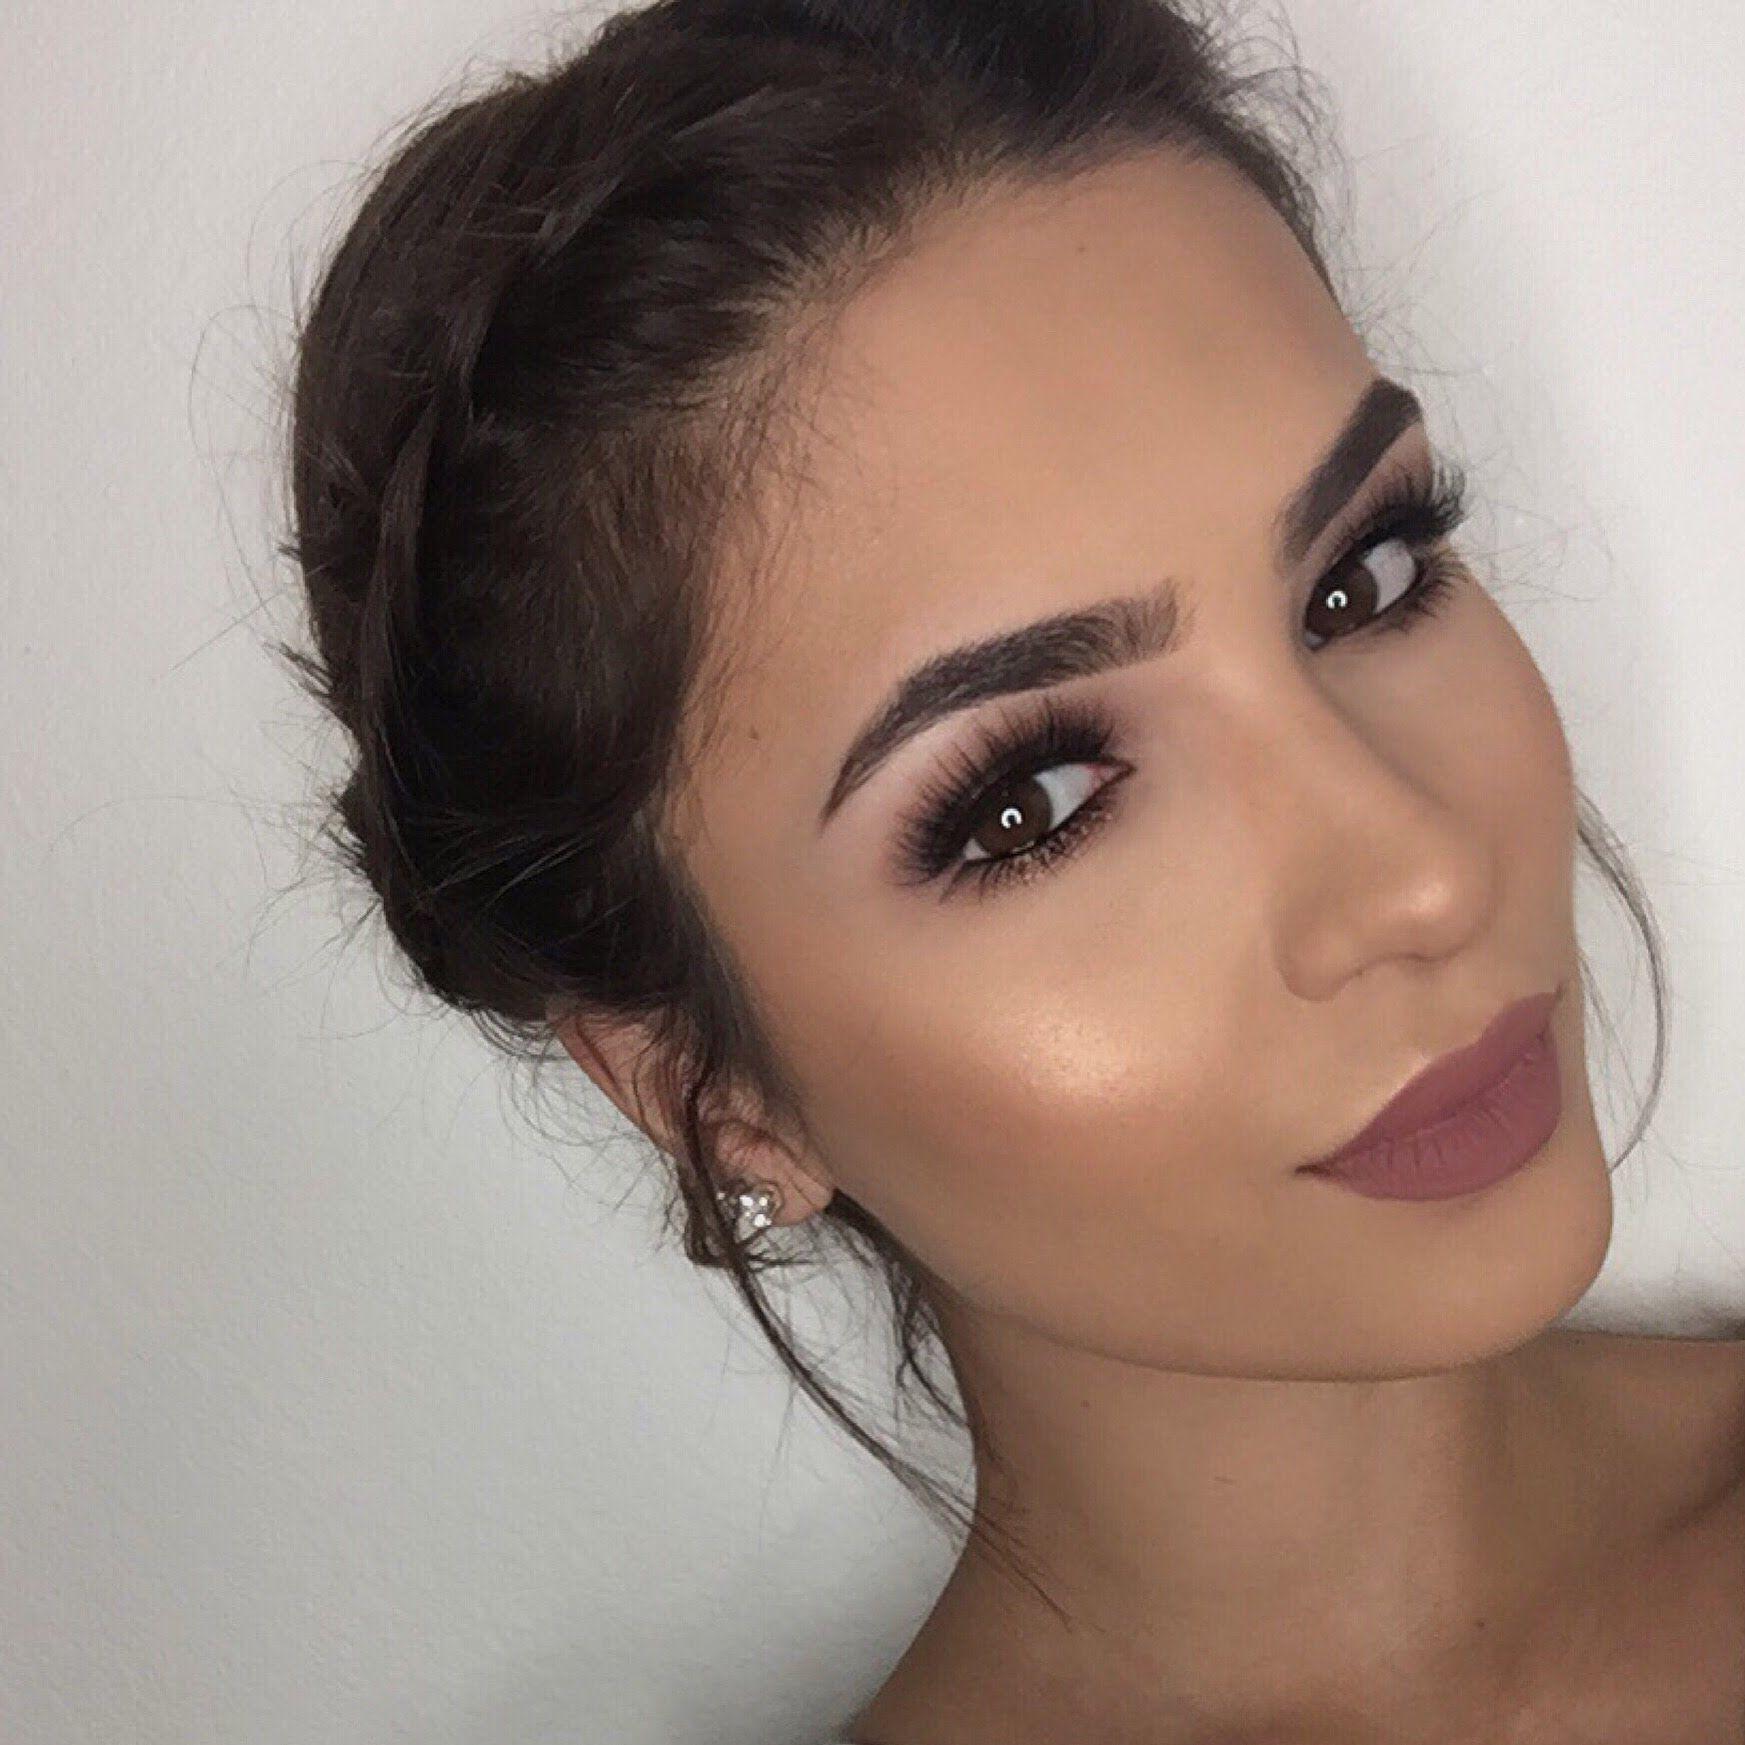 Bronze Smokey & Full Face Glam KOKOANDCHANEL YouTube